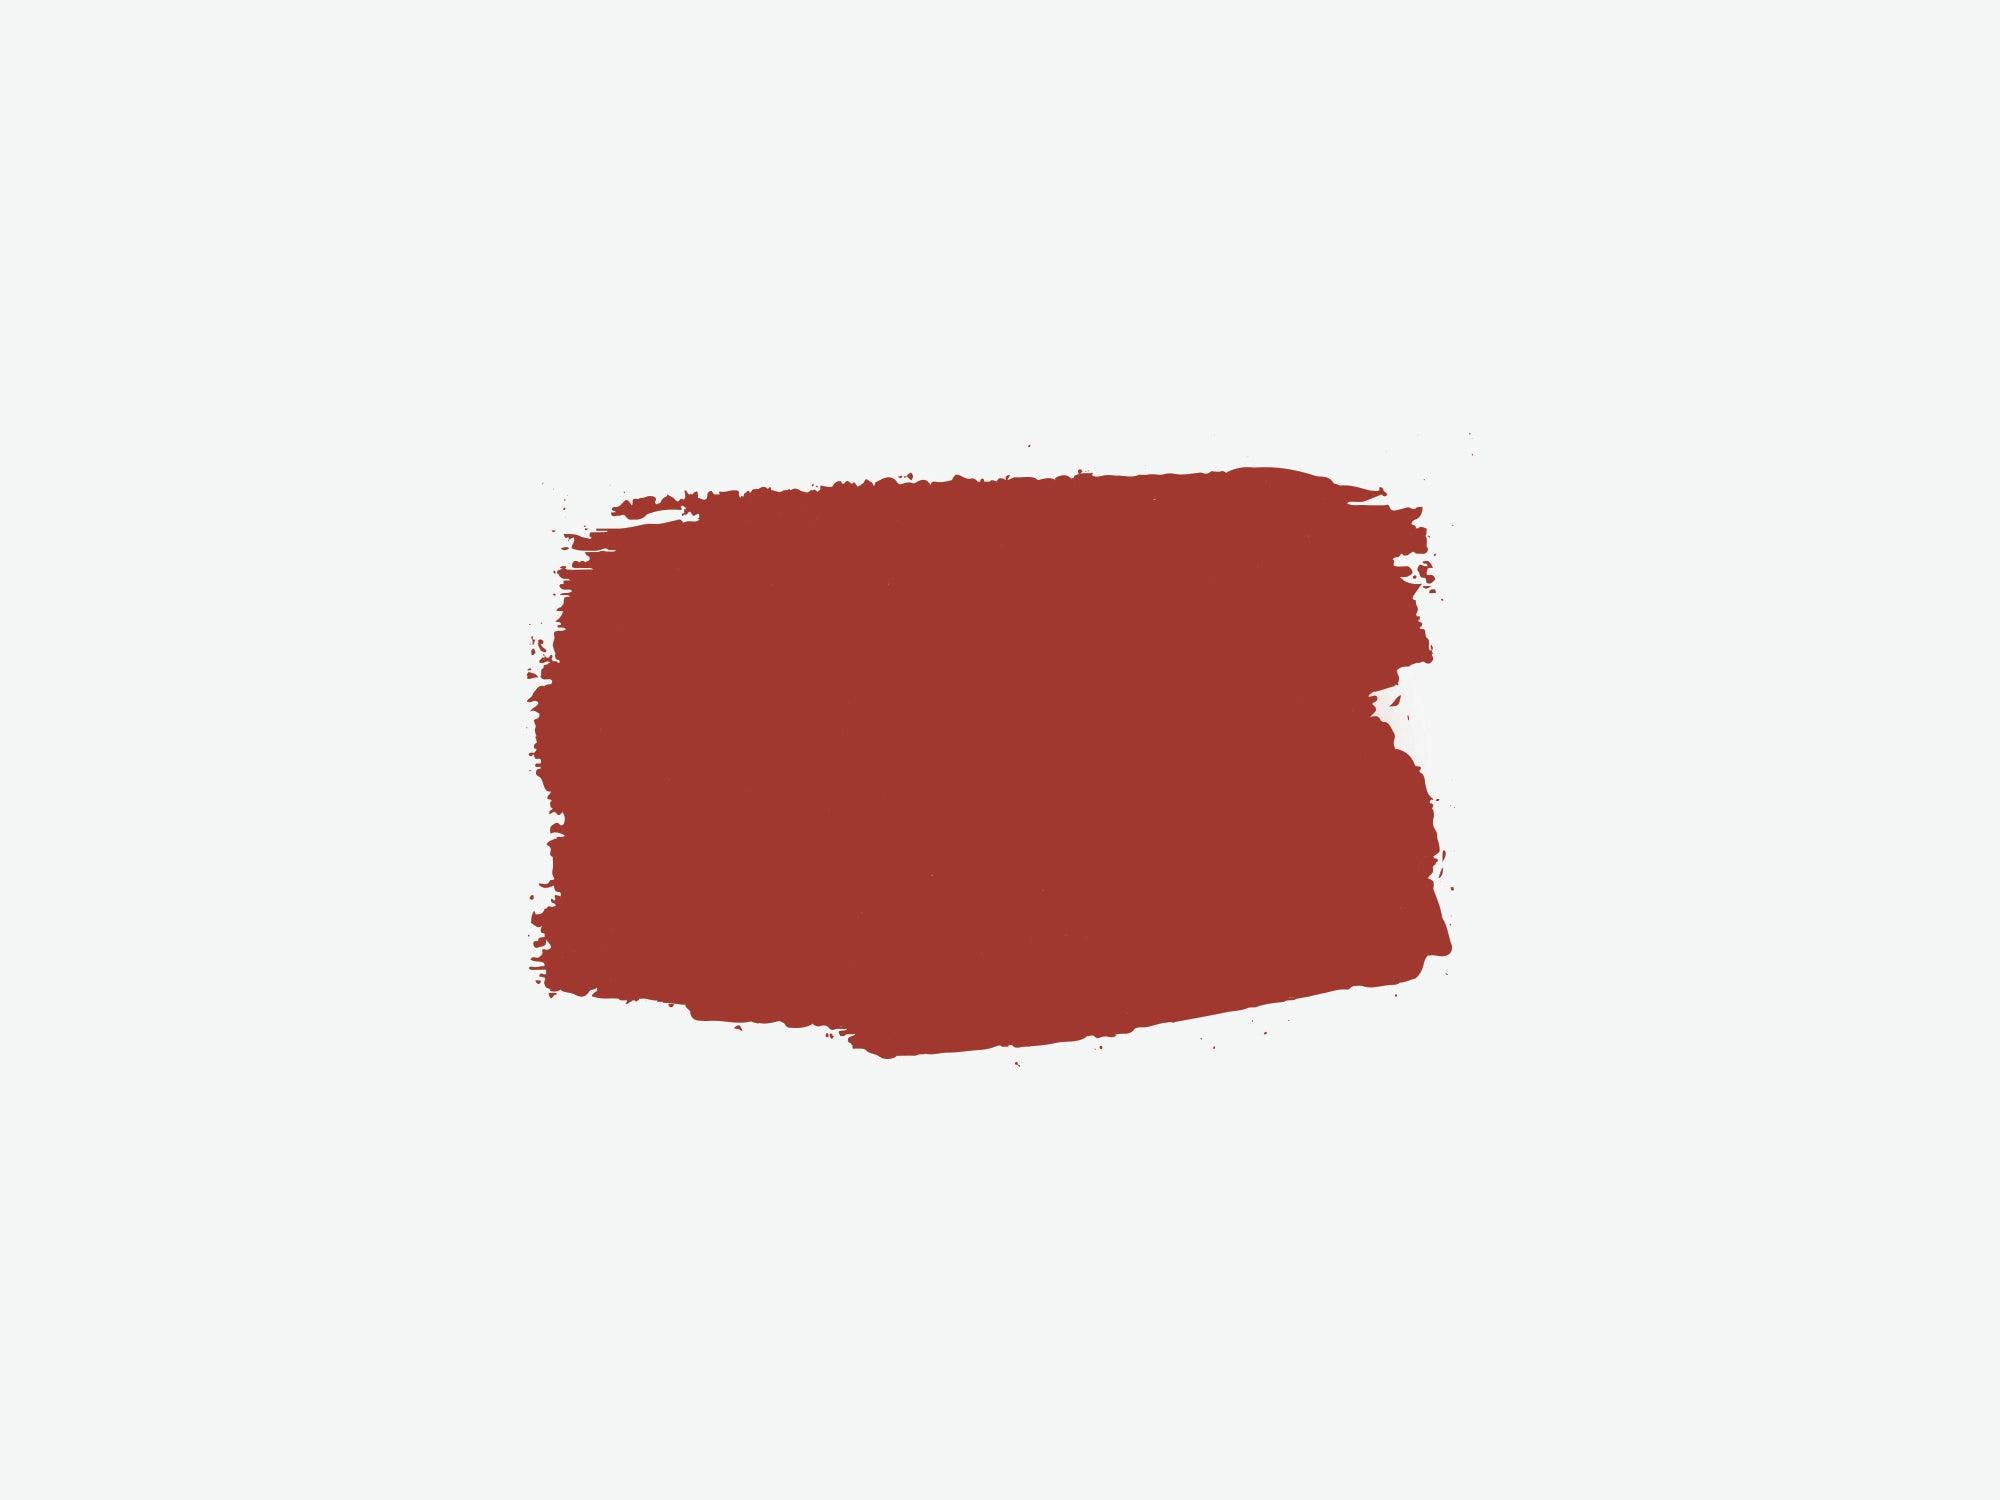 Paintswatch_Lipstick Red